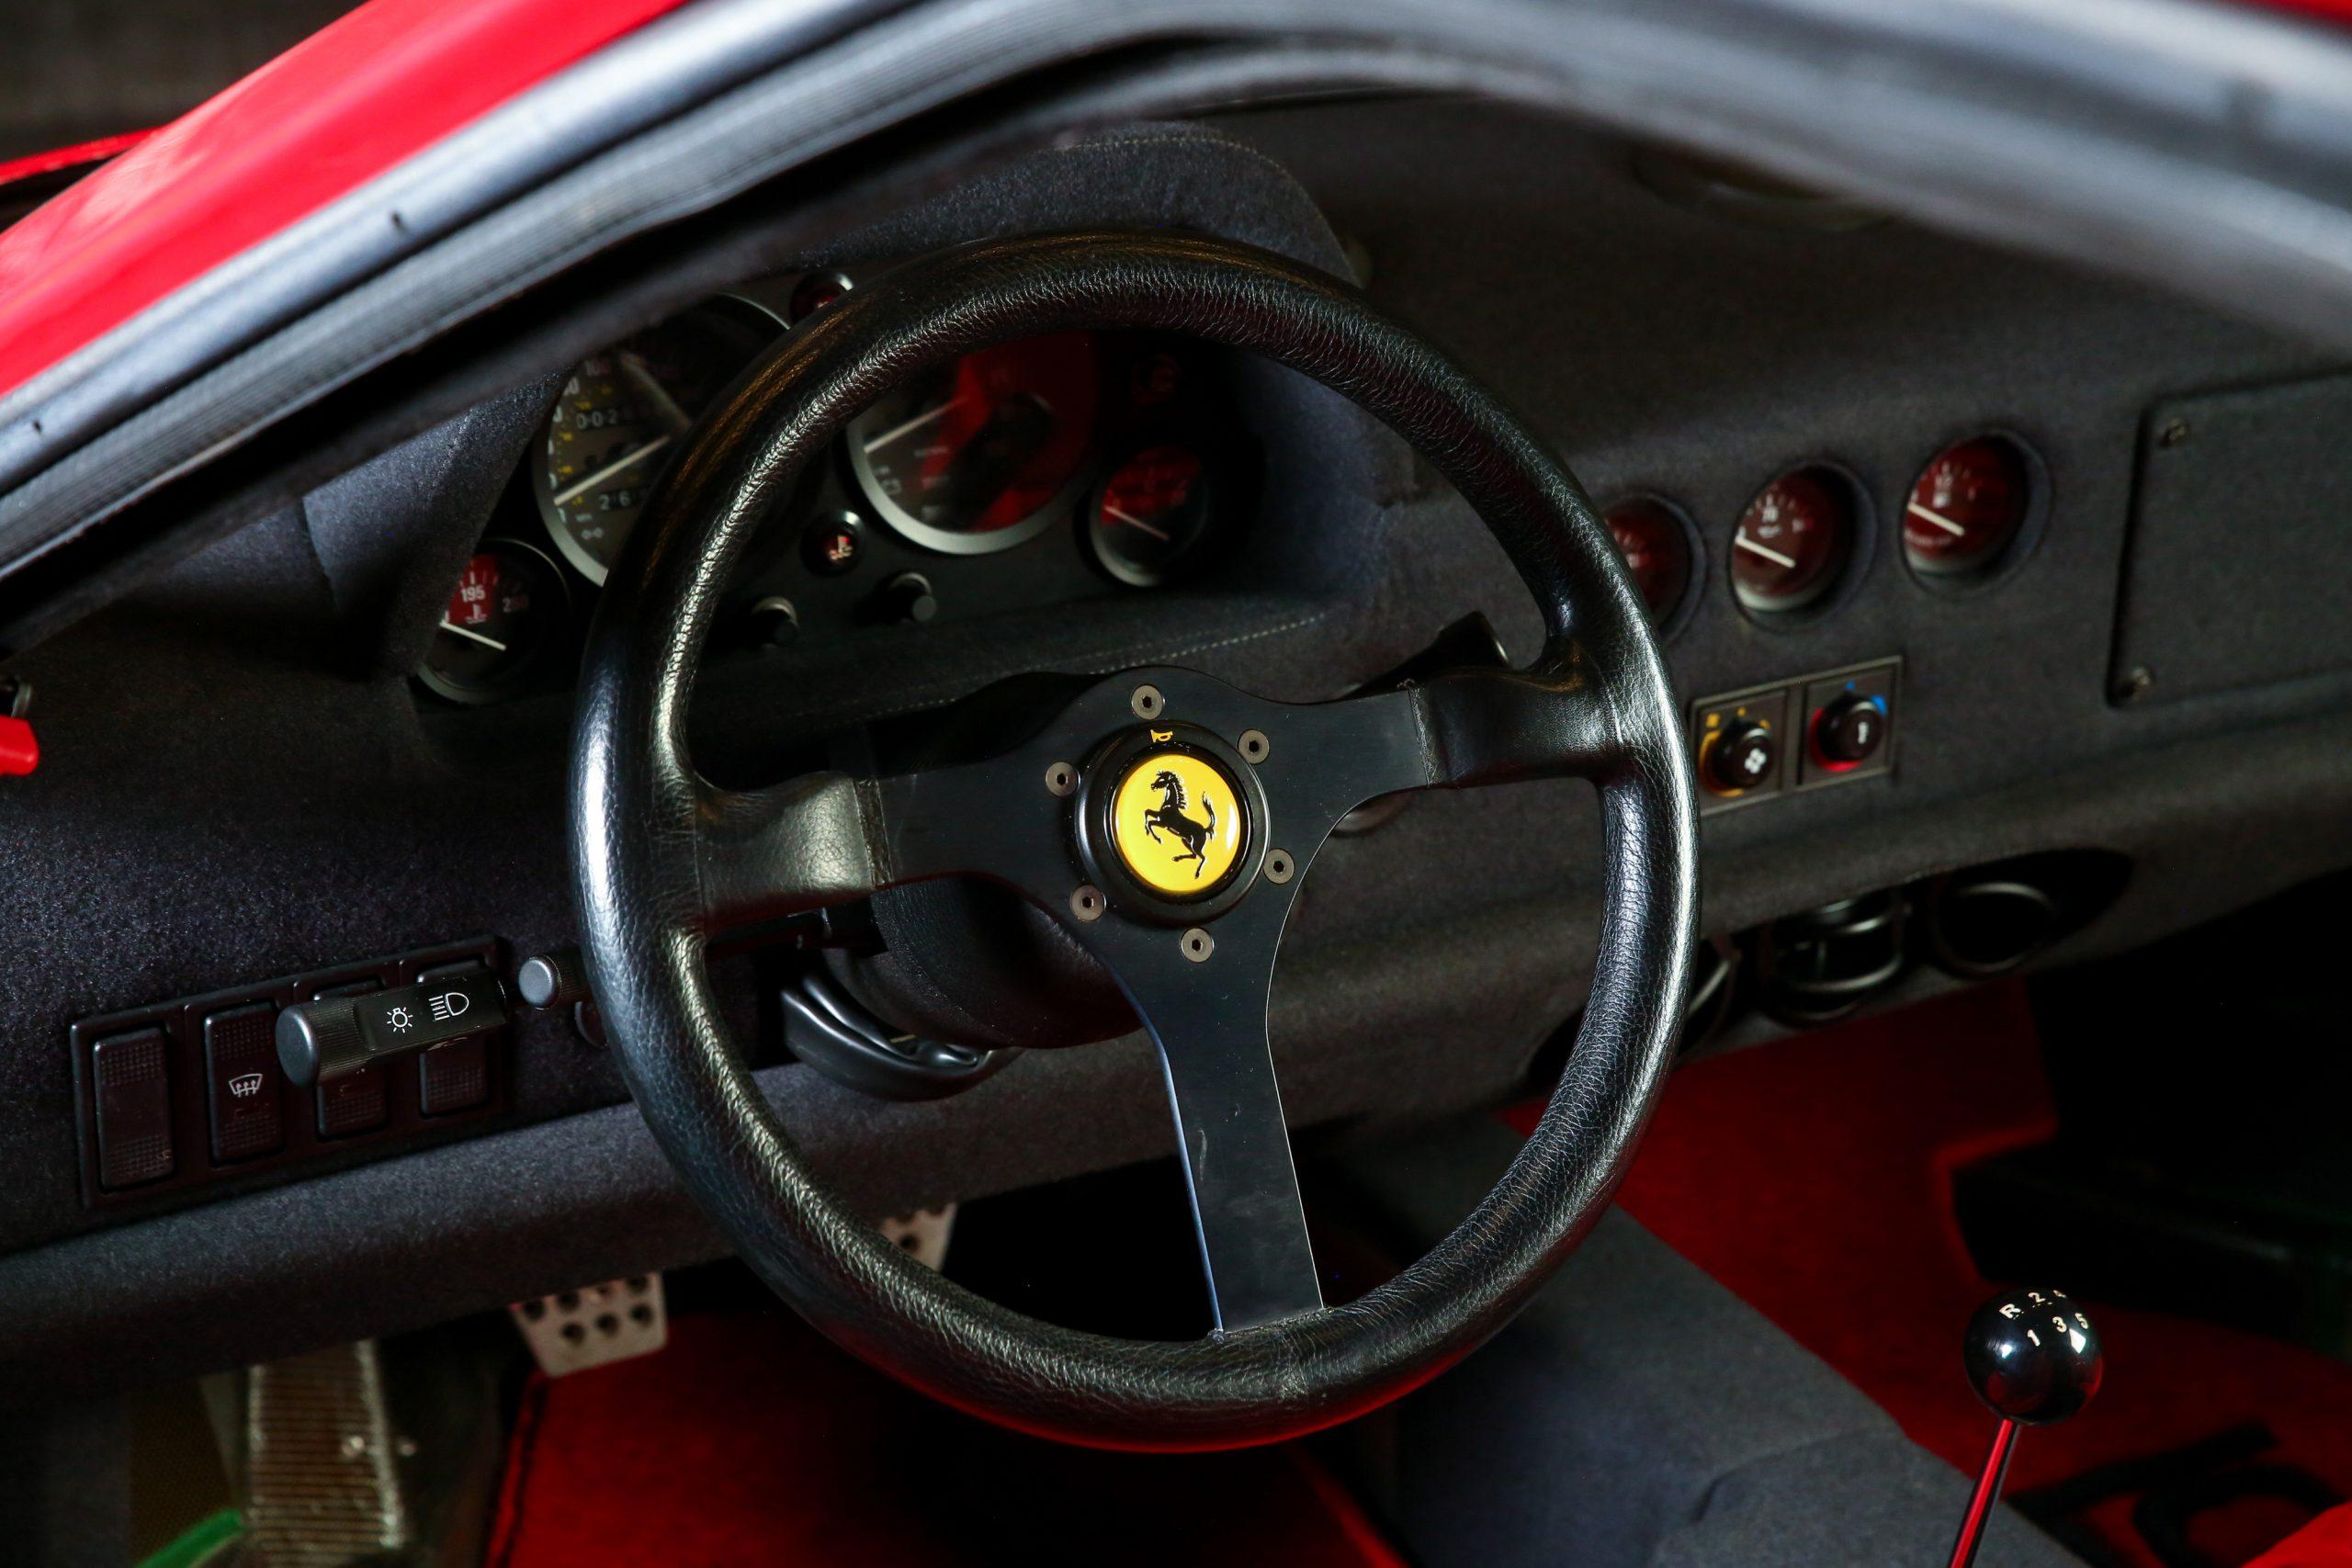 1991 Ferrari F40 interior steering wheel